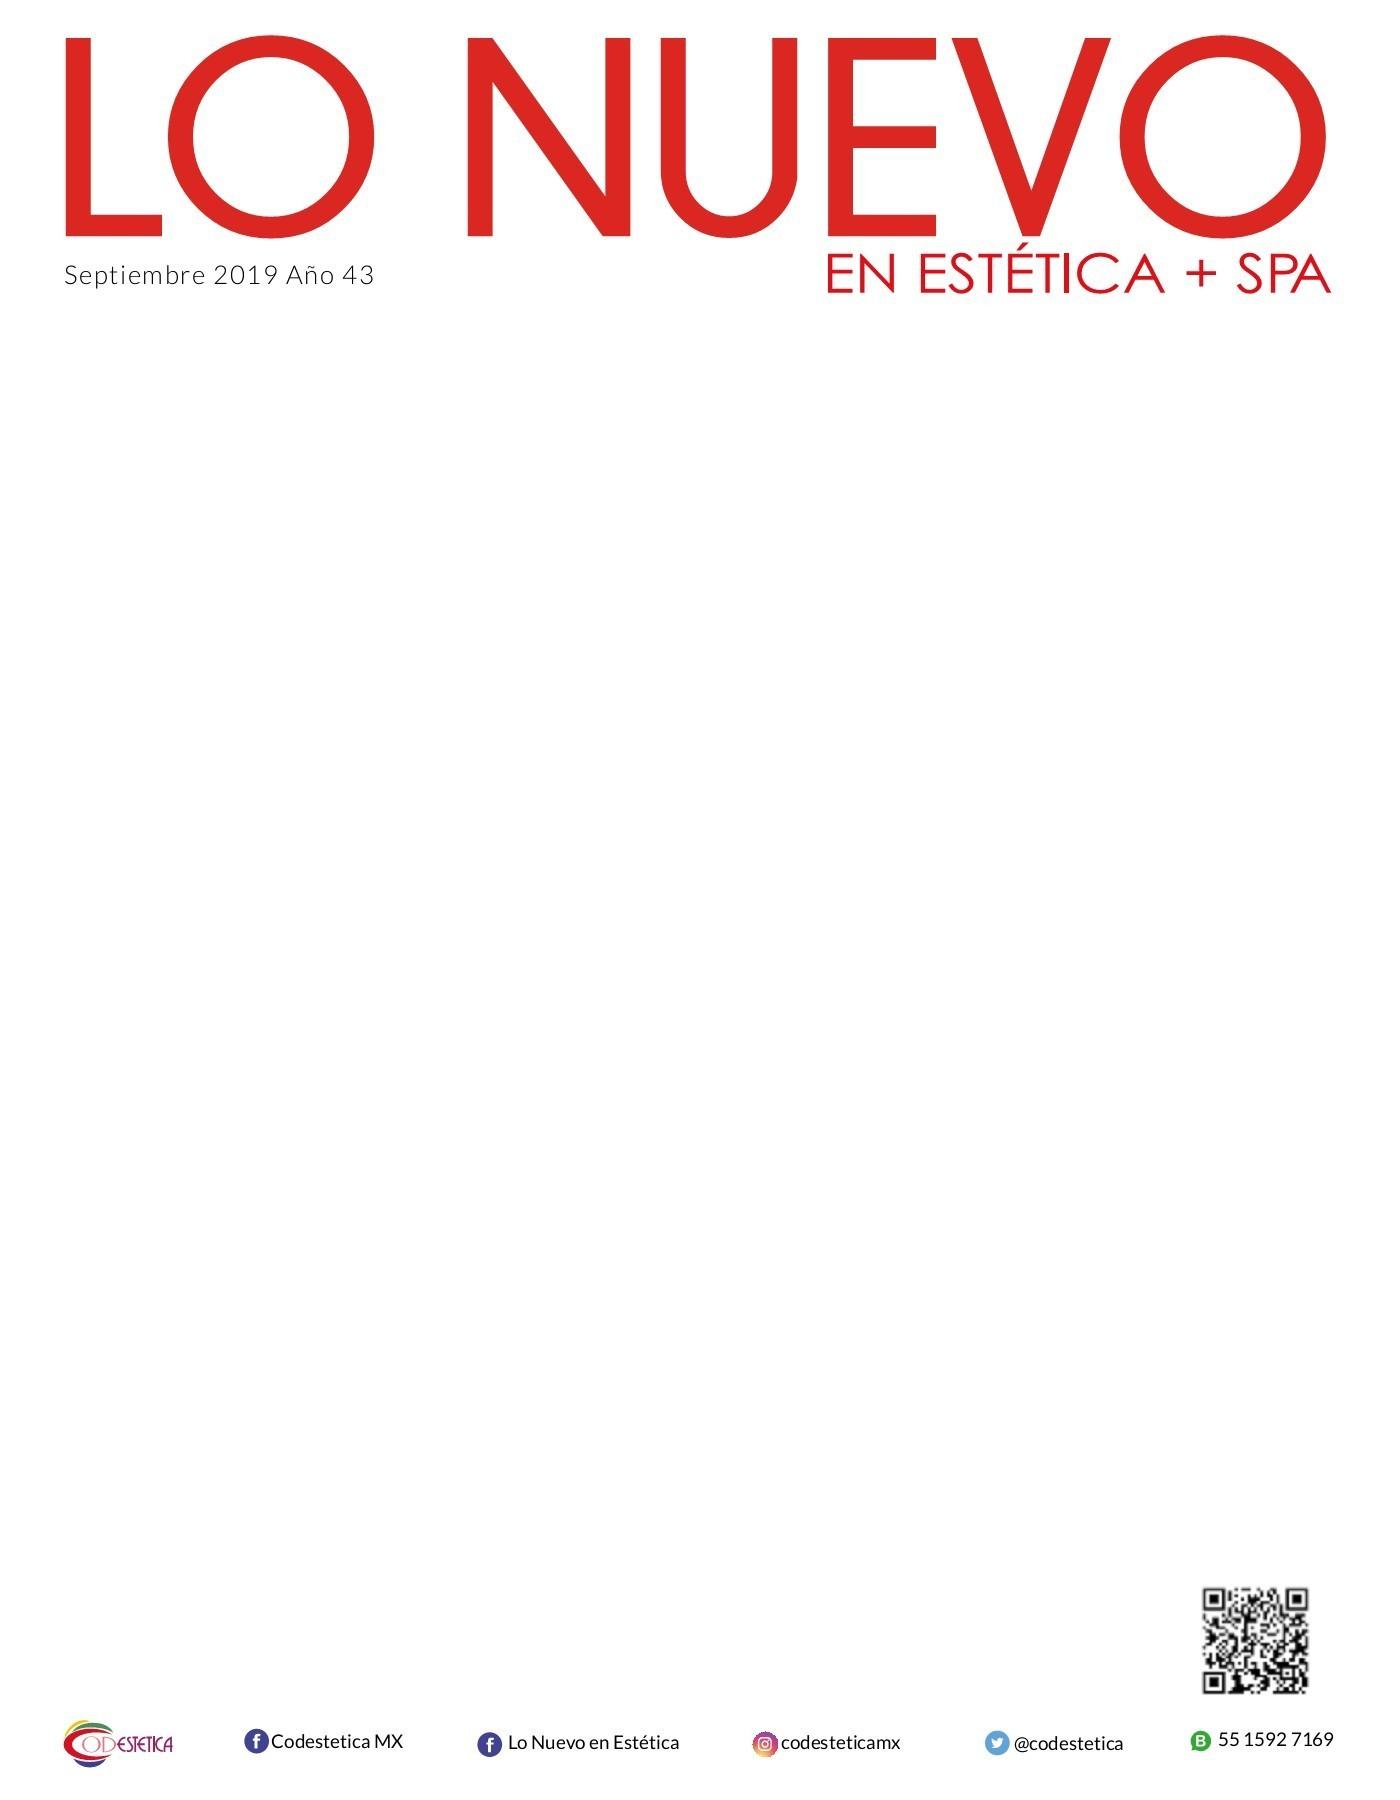 calendario laboral 2020 zaragoza pdf mas populares pre01 oct pages 1 50 text version of calendario laboral 2020 zaragoza pdf